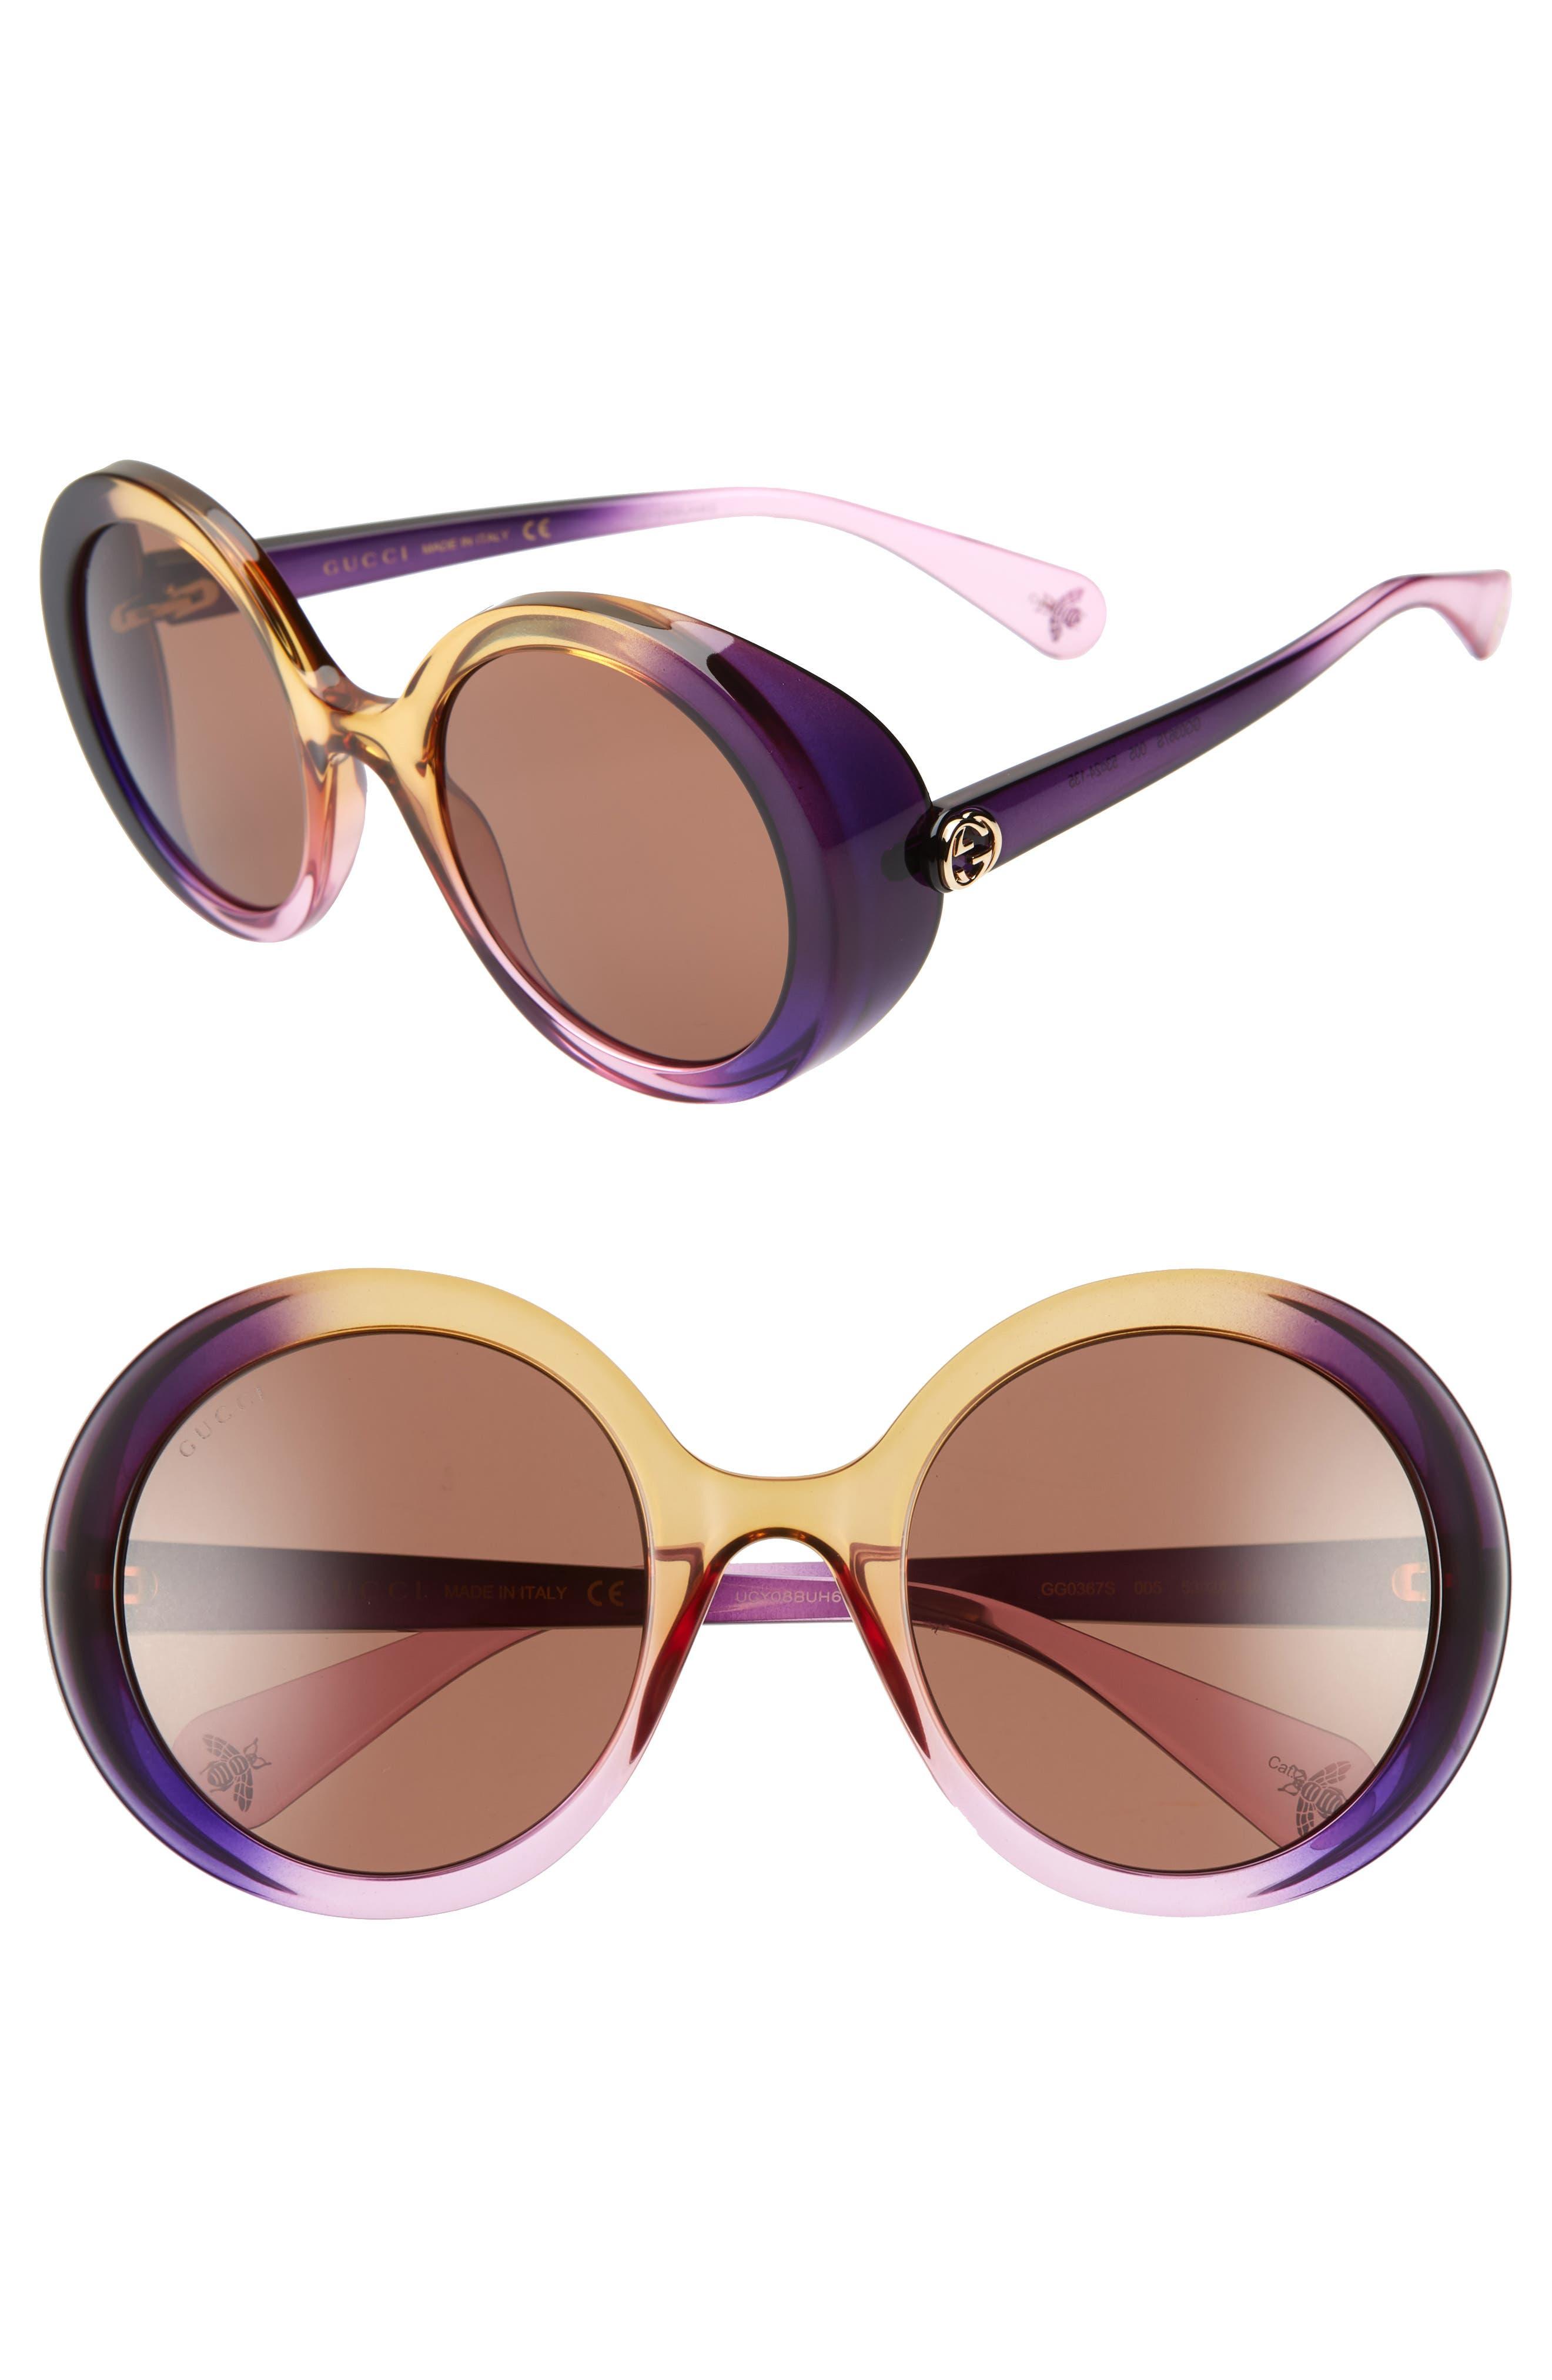 7c0ef980f7 Prada Cat Eye Hexagon Fantasy Purple Sunglasses New SPR05P. 1234567